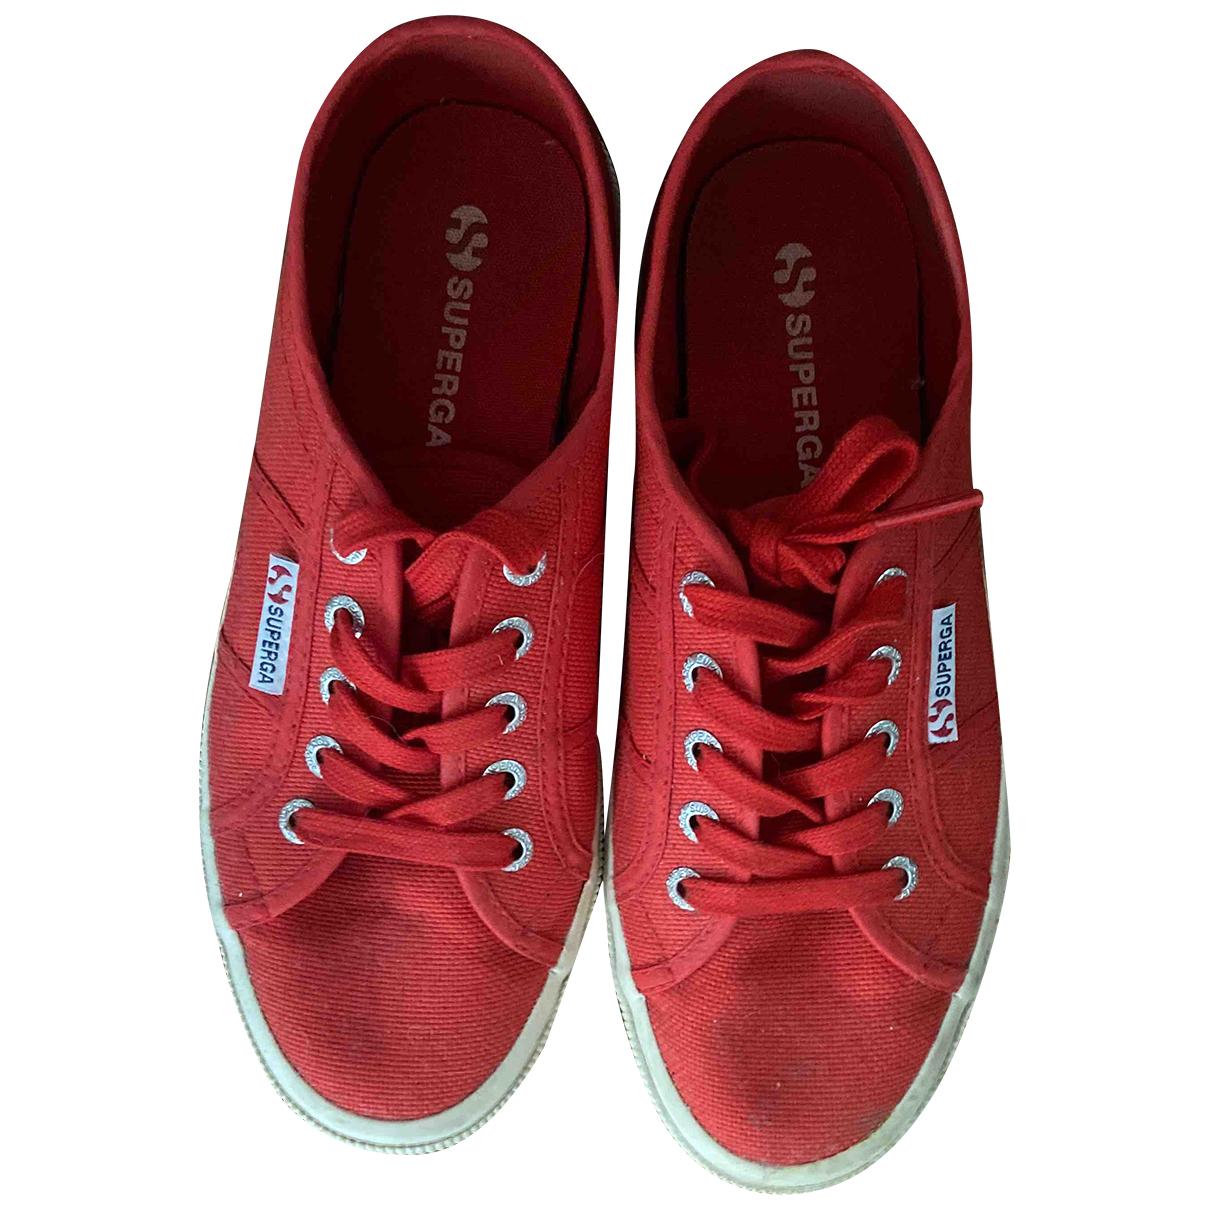 Superga N Red Cloth Trainers for Women 38 EU